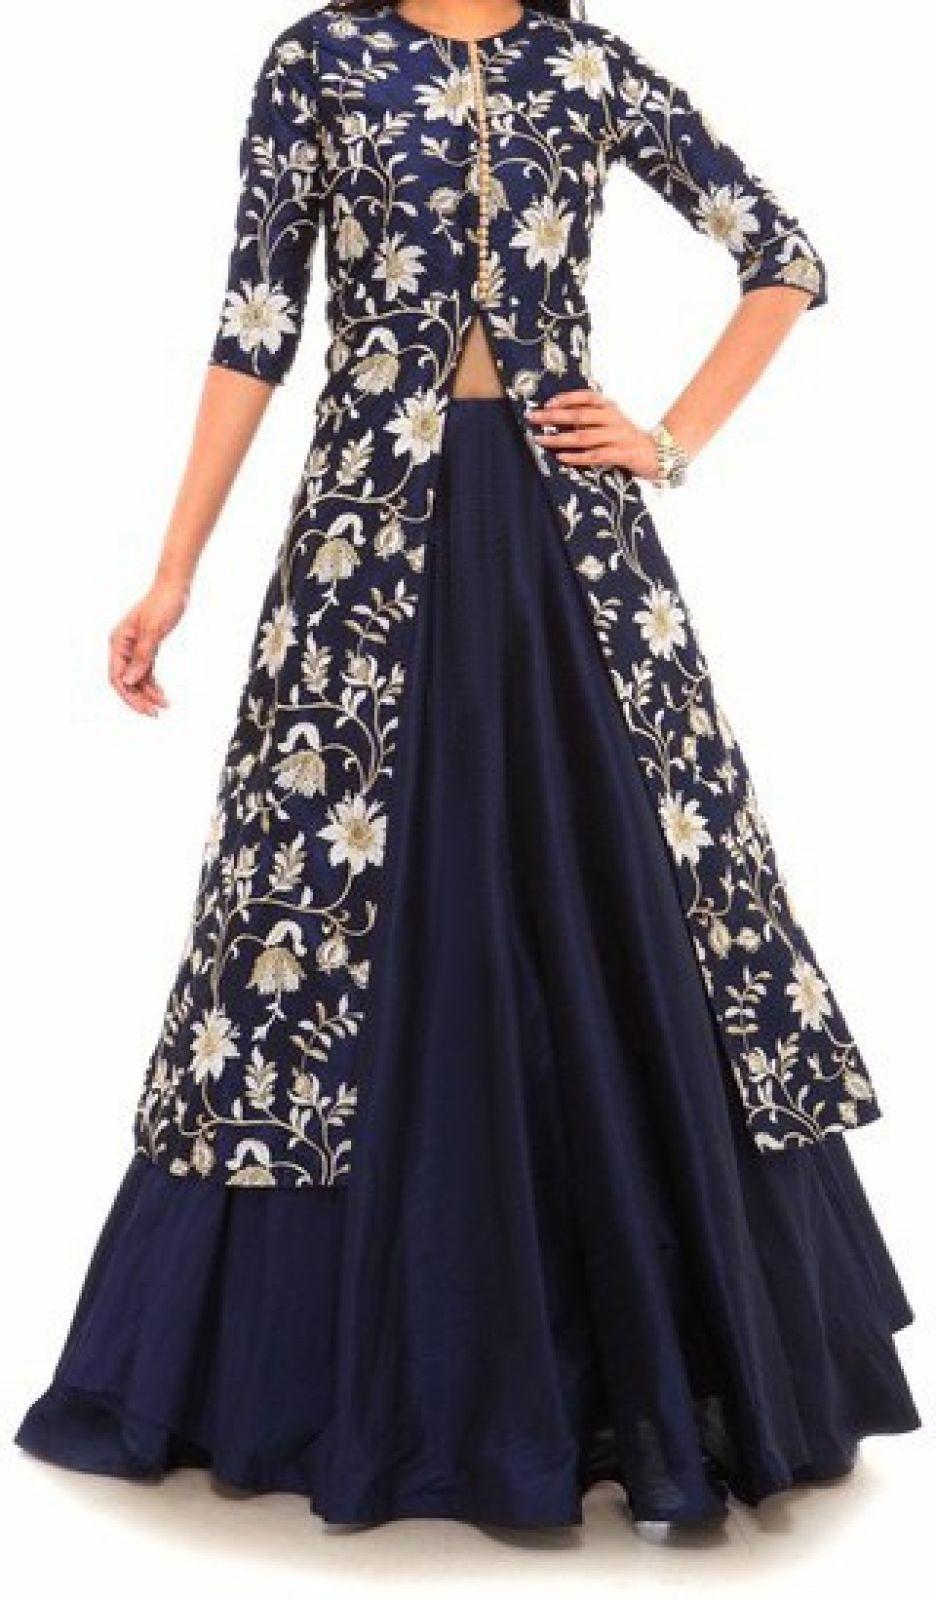 a737b68c339ec1 Astha Designer Embroidered Women's Ghagra, Choli, Dupatta Set - Buy Blue  Astha Designer Embroidered